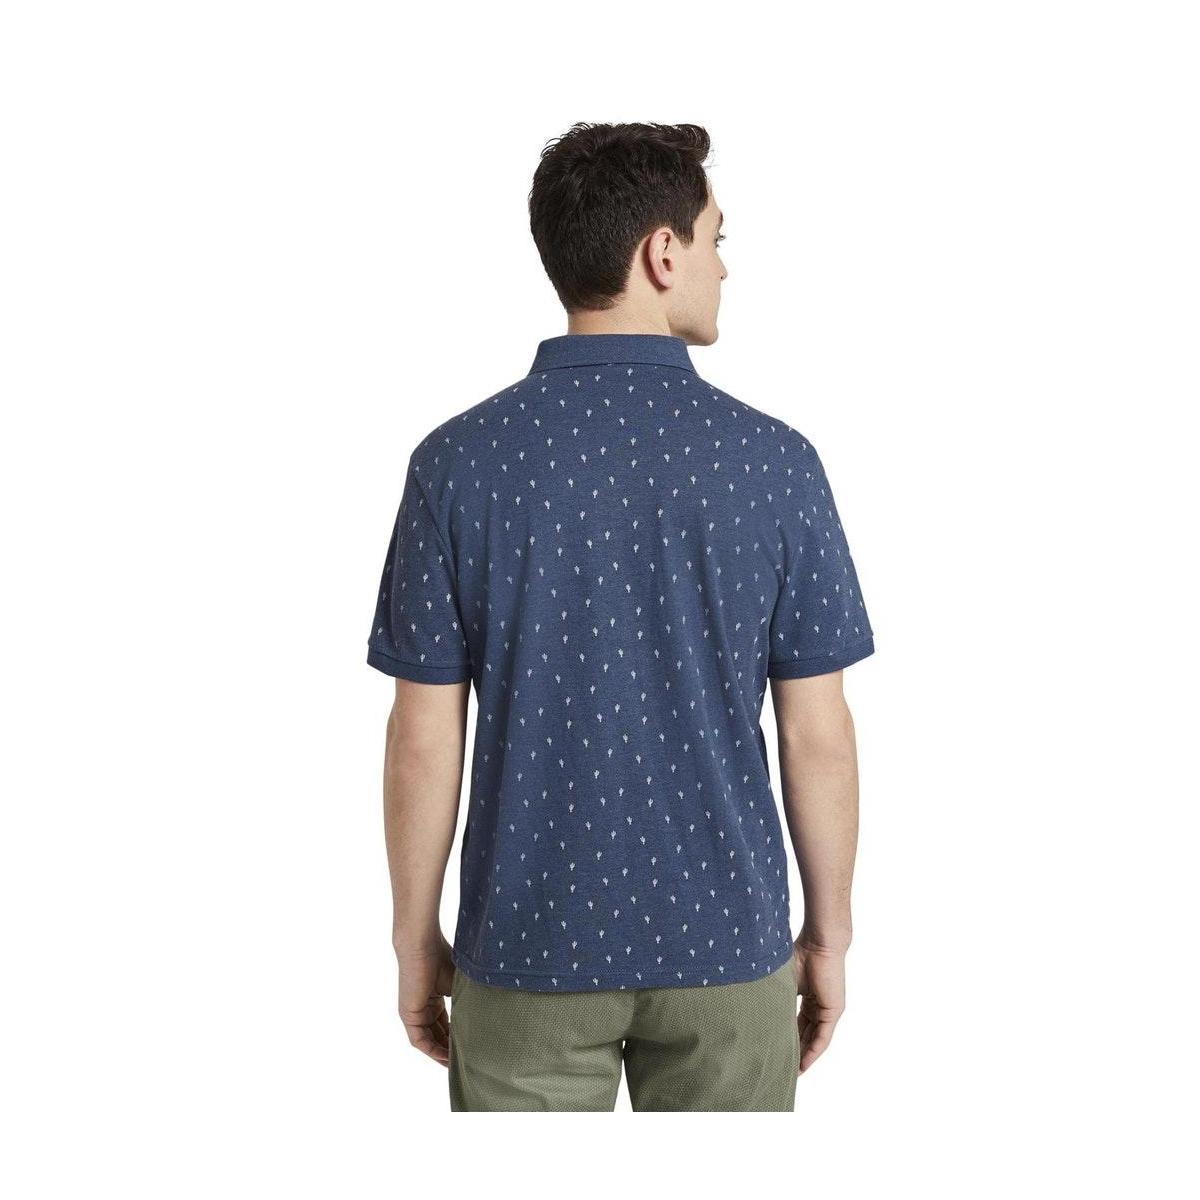 polo met cactus patroon 1019676xx10 tom tailor polo 23405